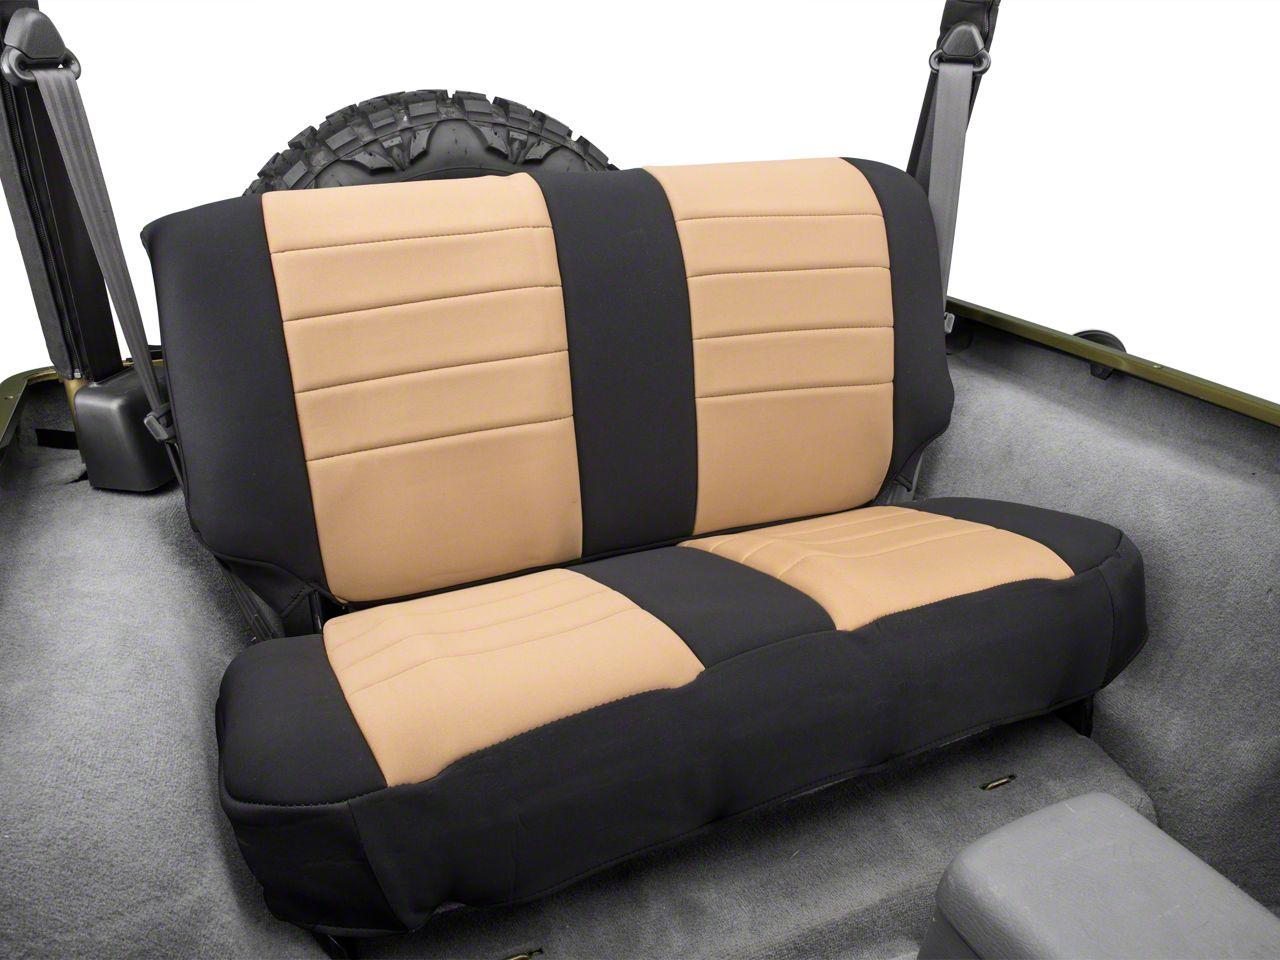 Rugged Ridge Neoprene Rear Seat Cover - Tan/Black (97-02 Jeep Wrangler TJ)